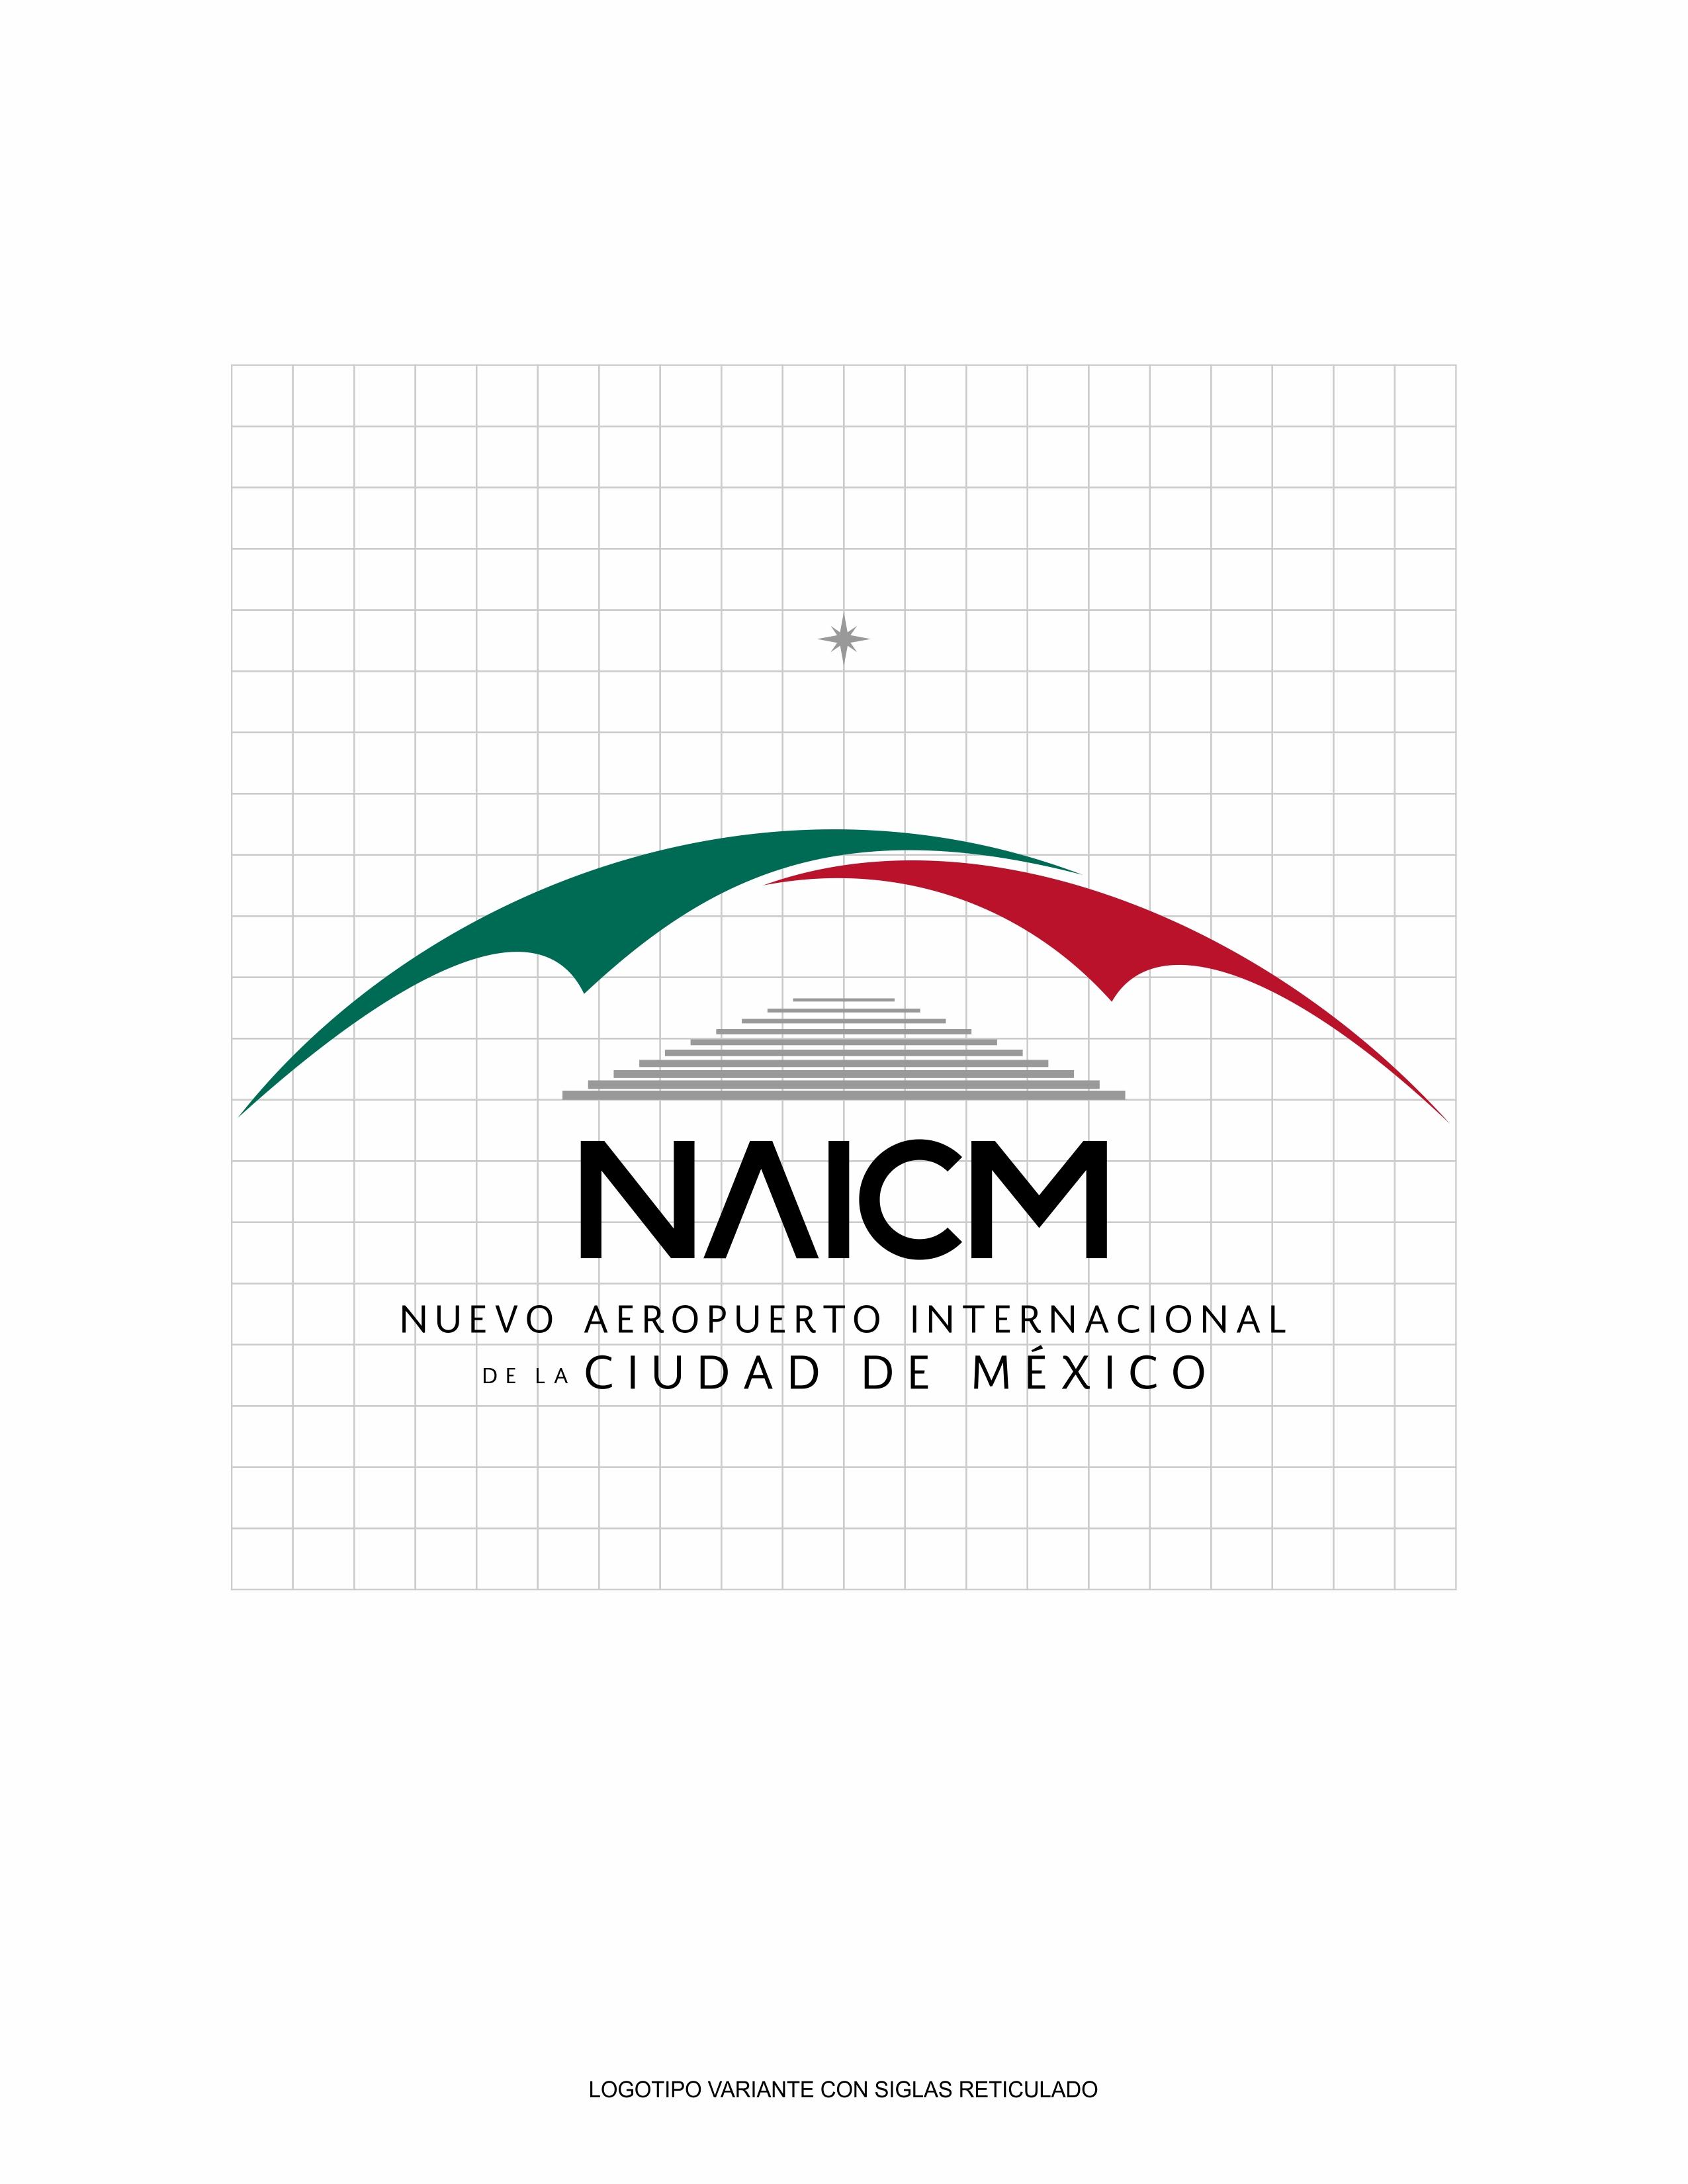 logotipo naicm luis ochoa designio